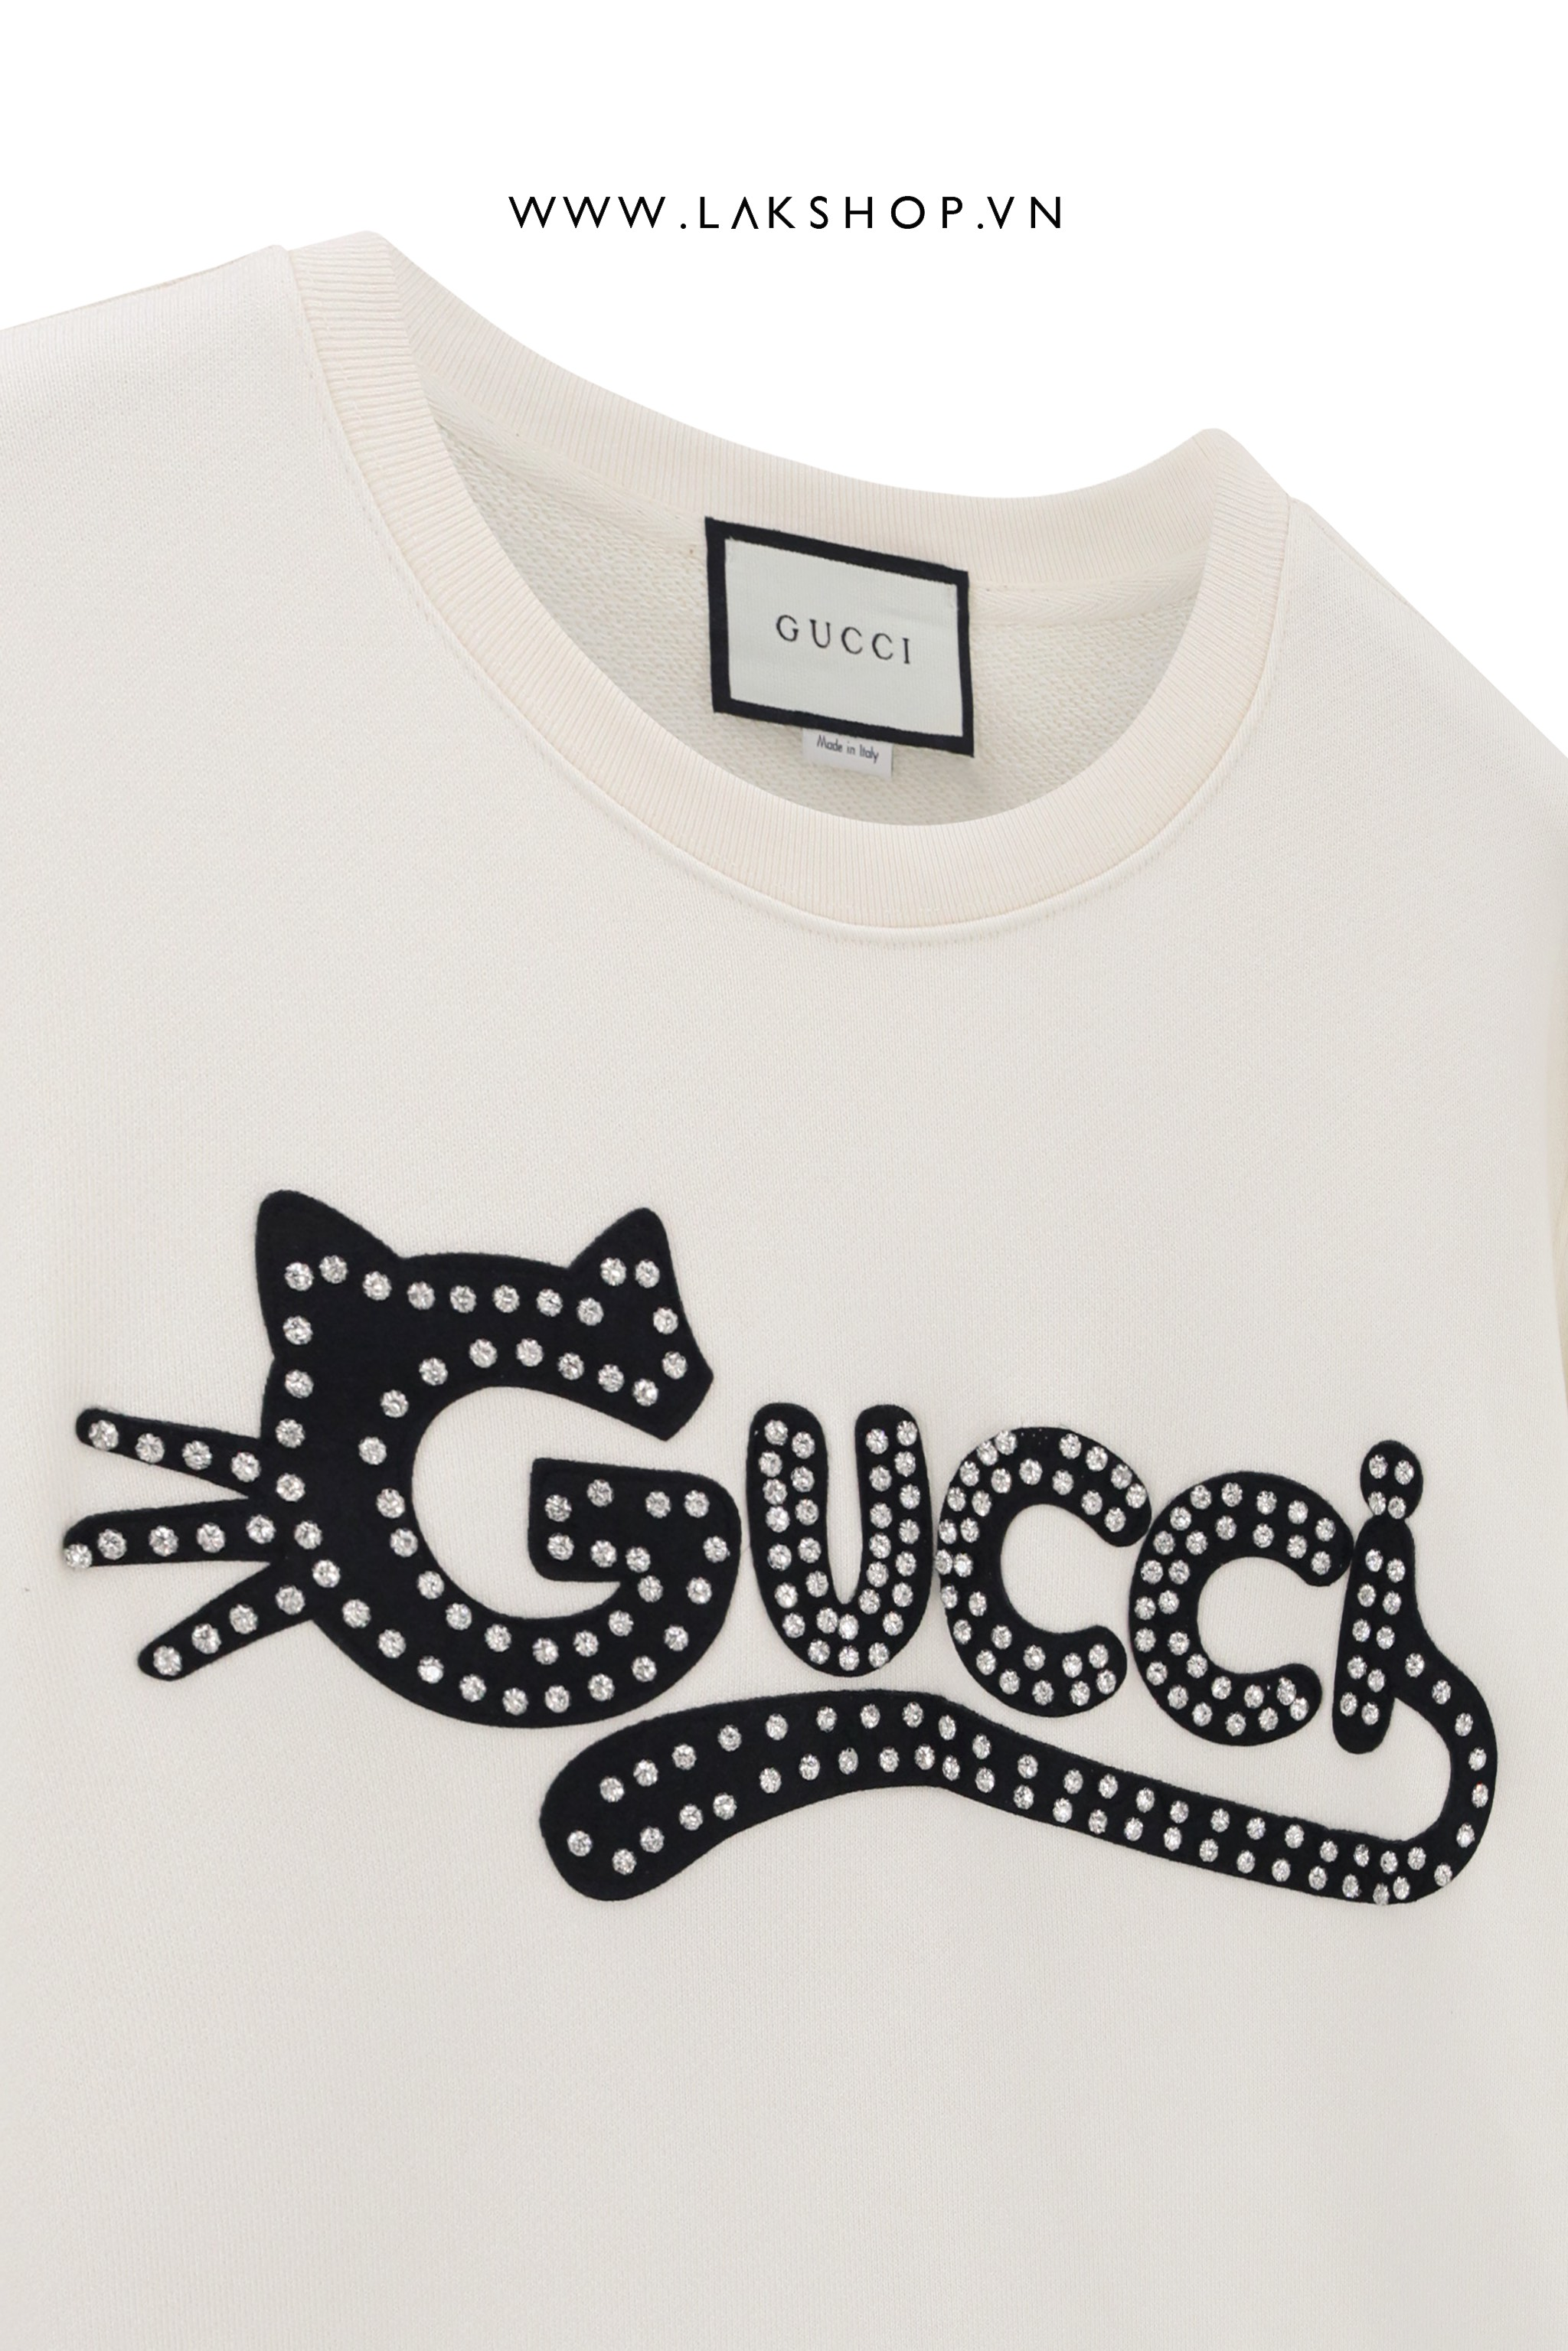 Dior and Shawn Logo Trim Embroidered Black Polo Shirt cv2